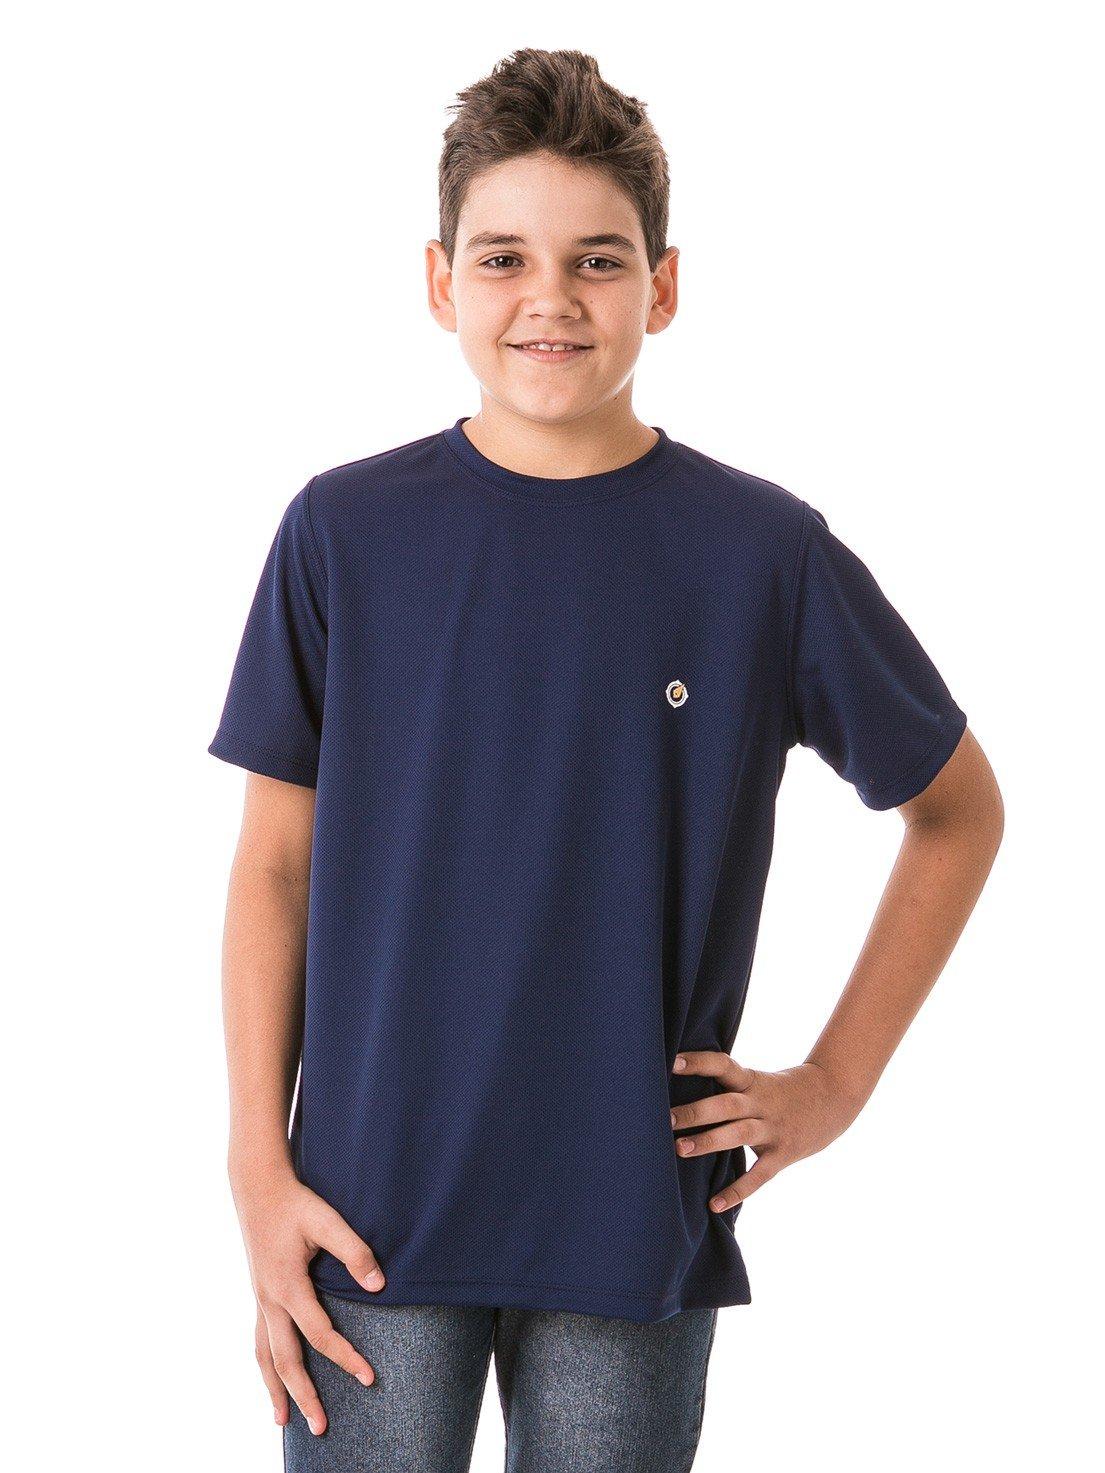 infantil masculinas t shirt curta dry azul frente b